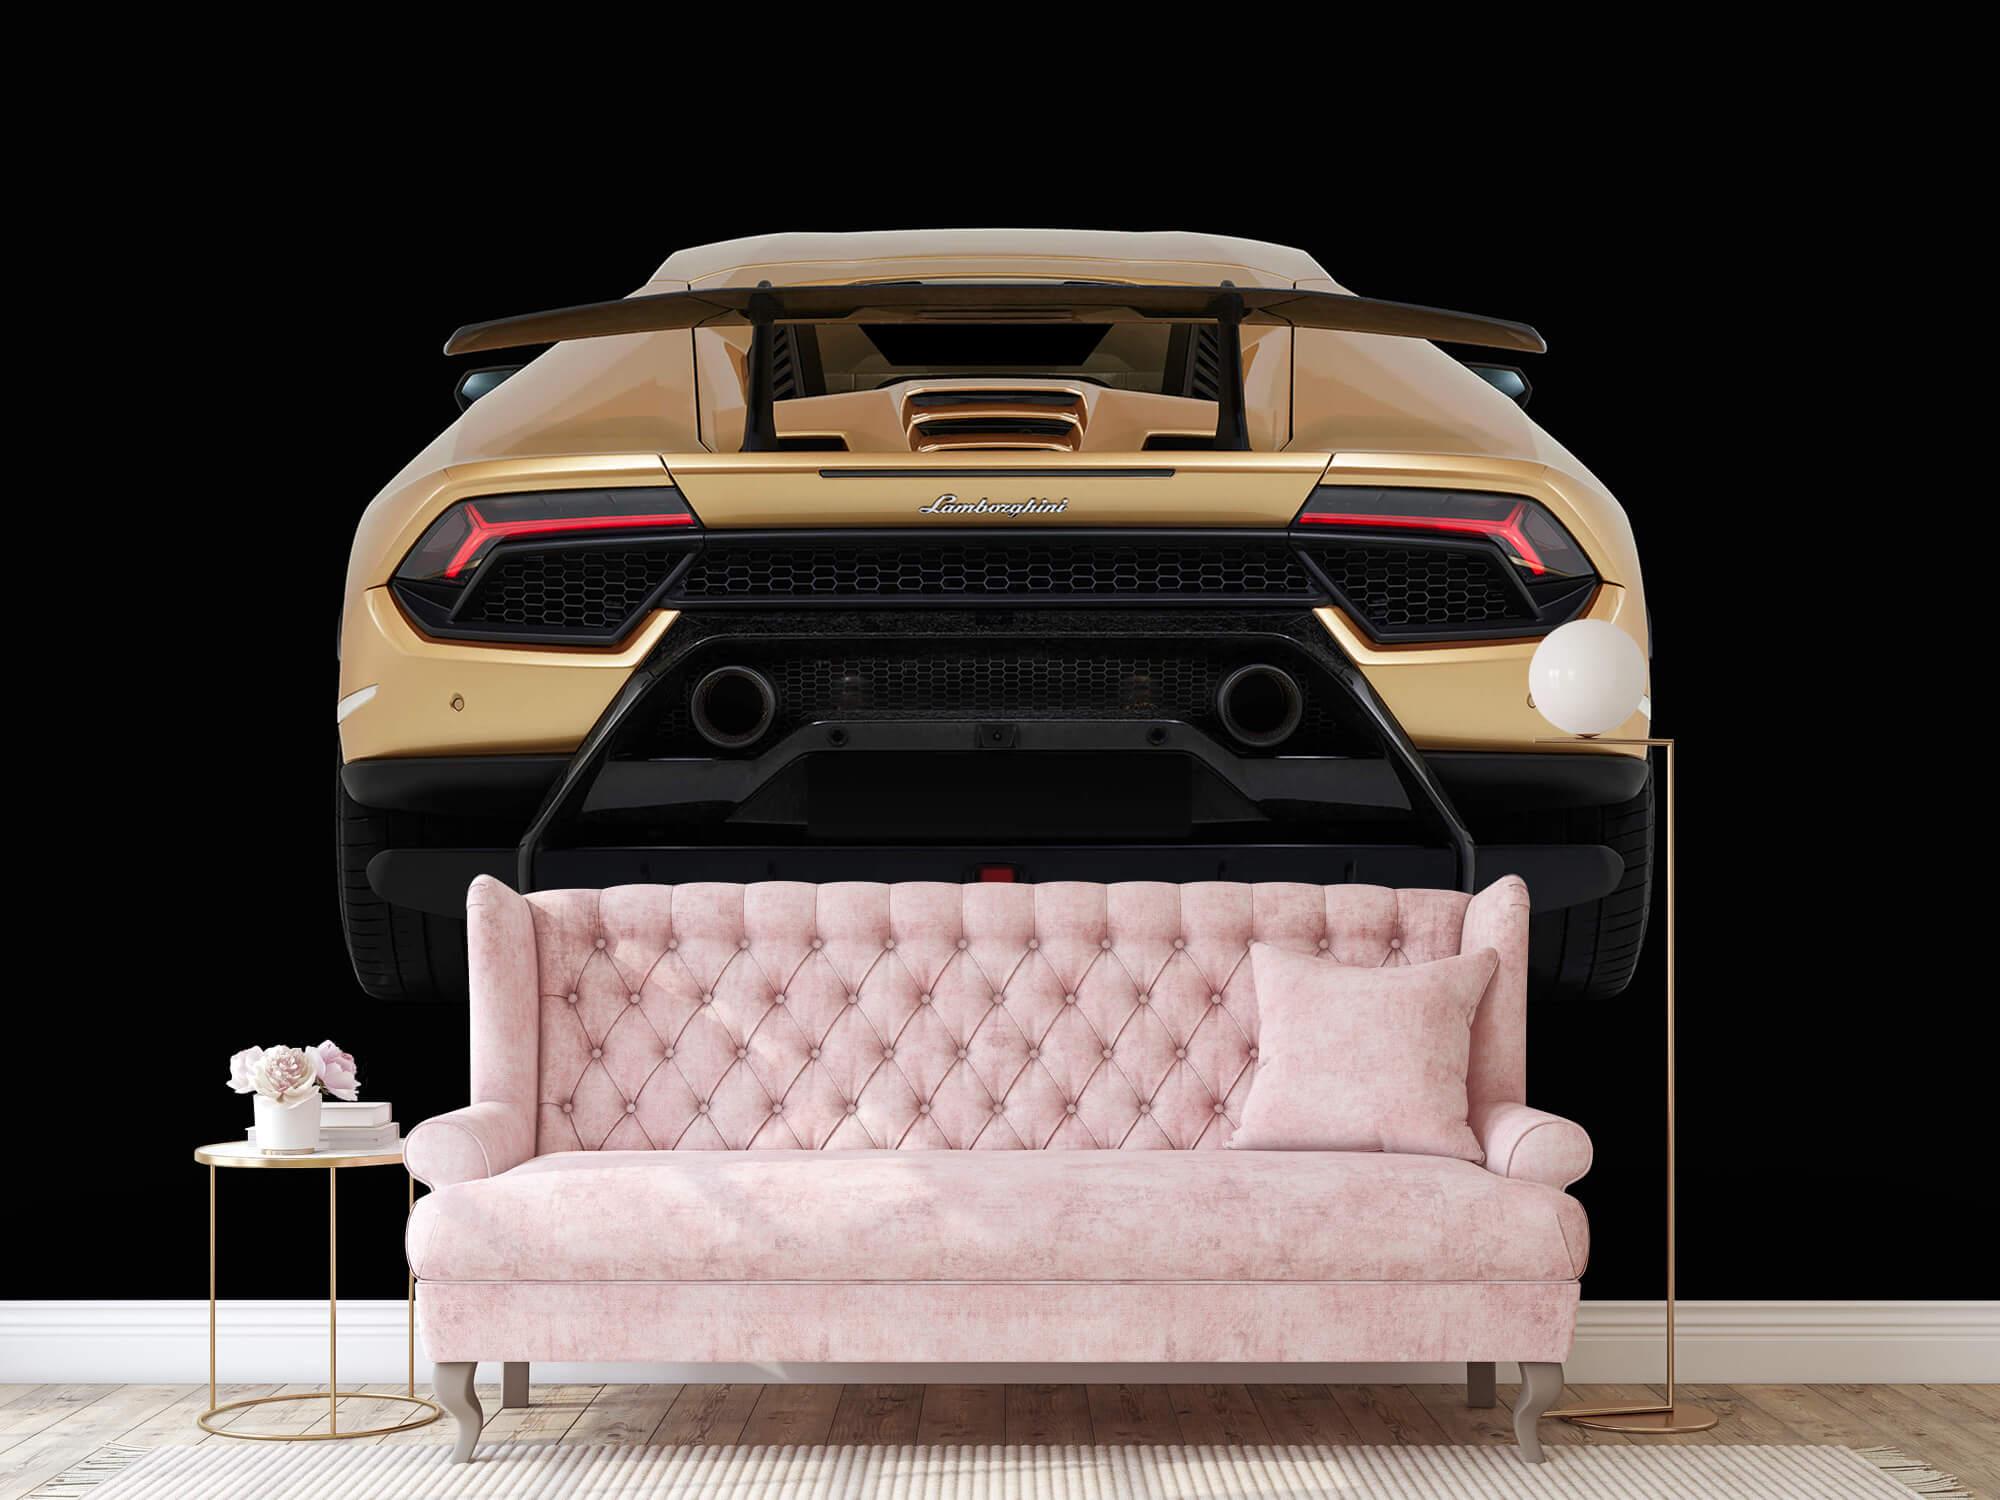 Wallpaper Lamborghini Huracán - Rear view, black 13